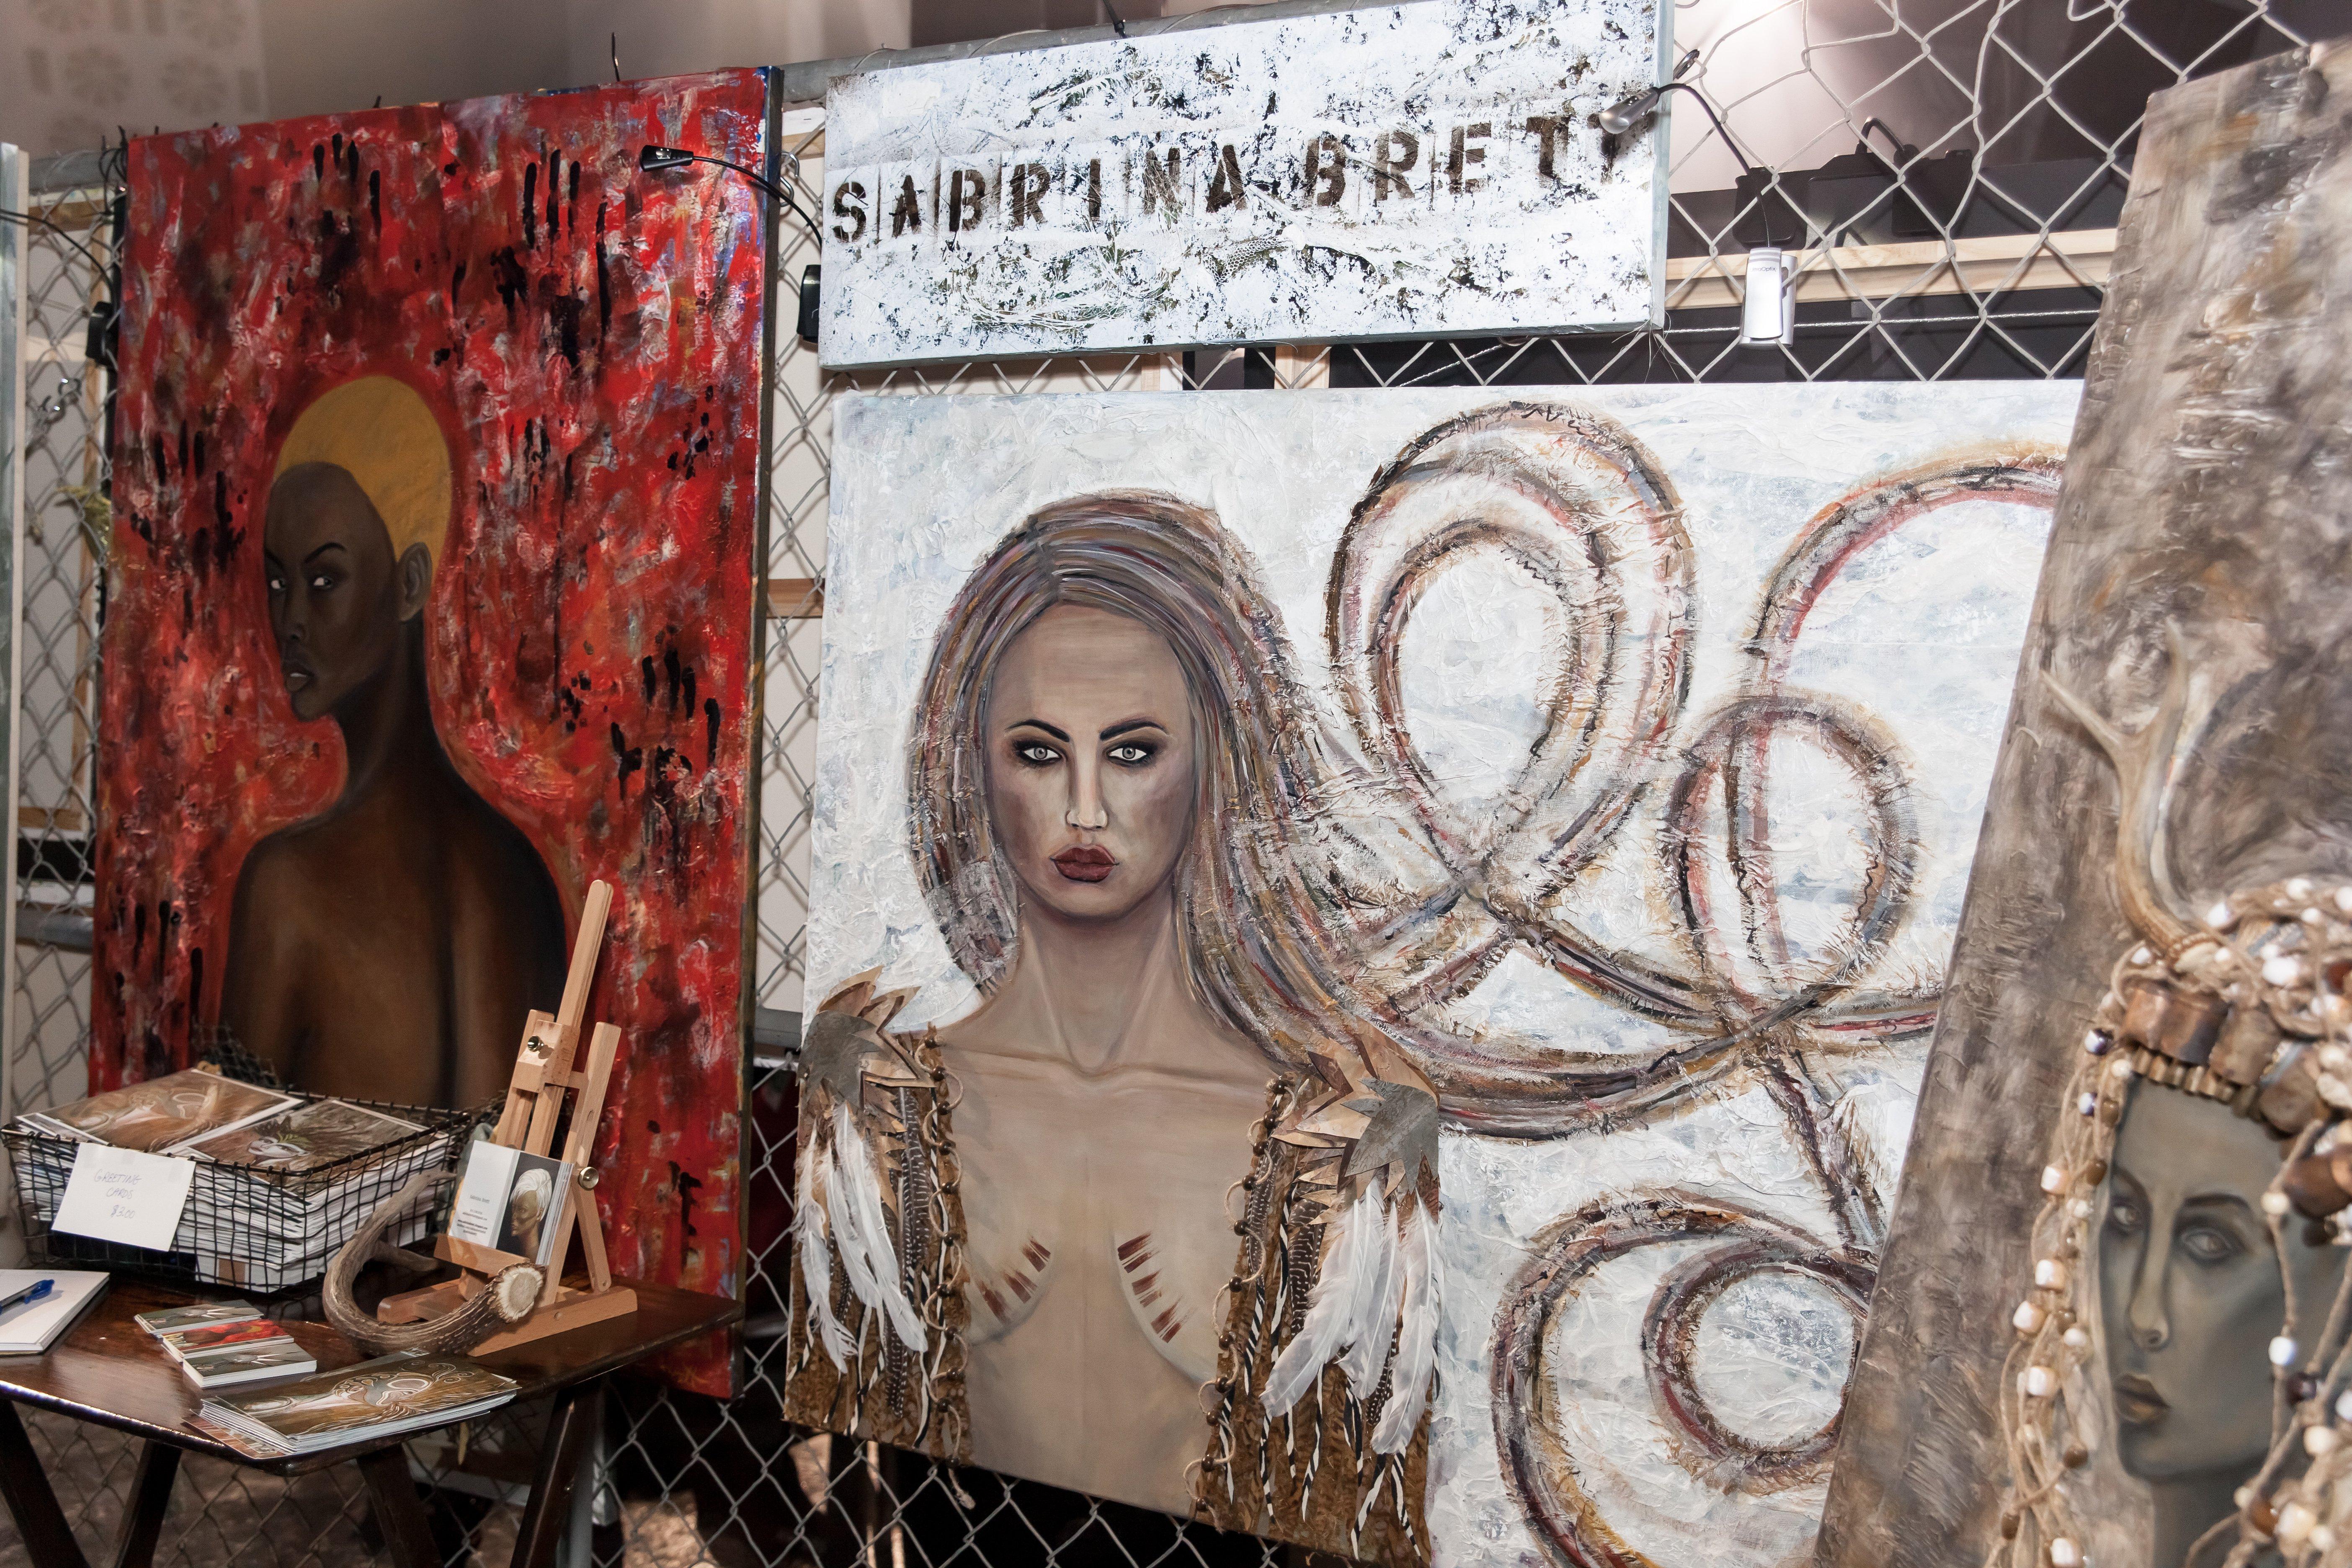 RAW San Francisco Art Show by Sabrina Brett